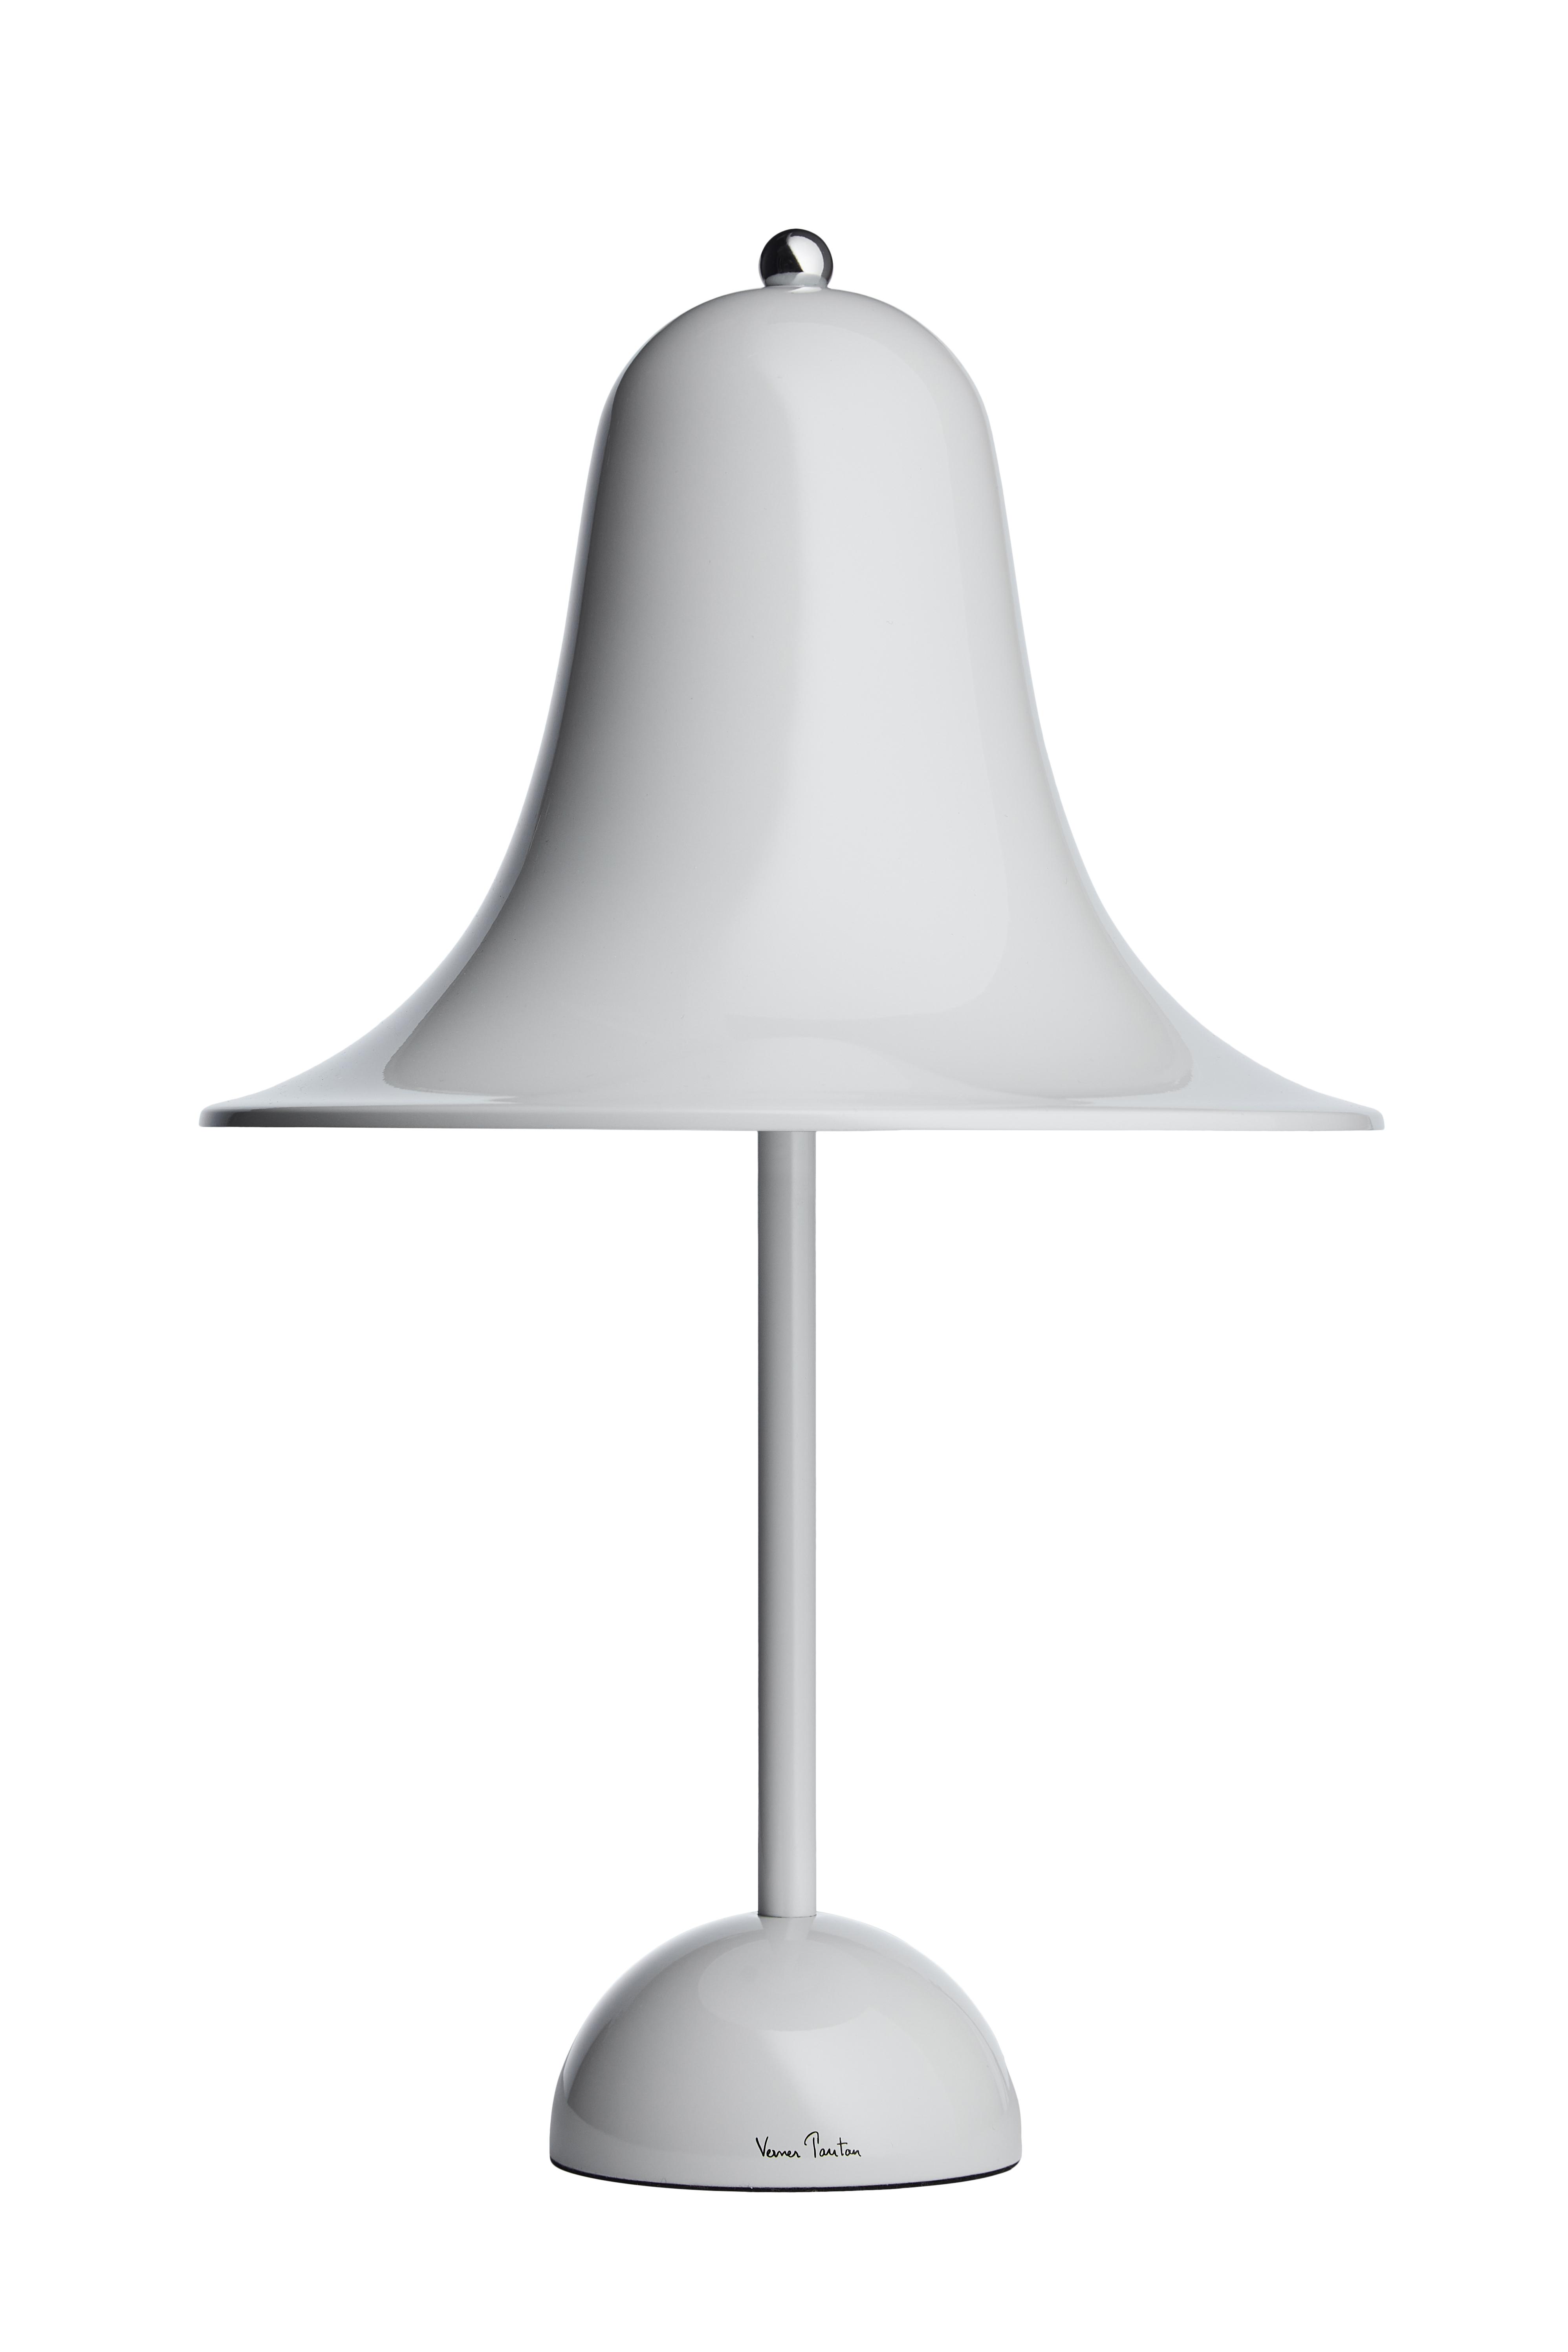 Verner Panton Pantop bordlampe, 23 cm